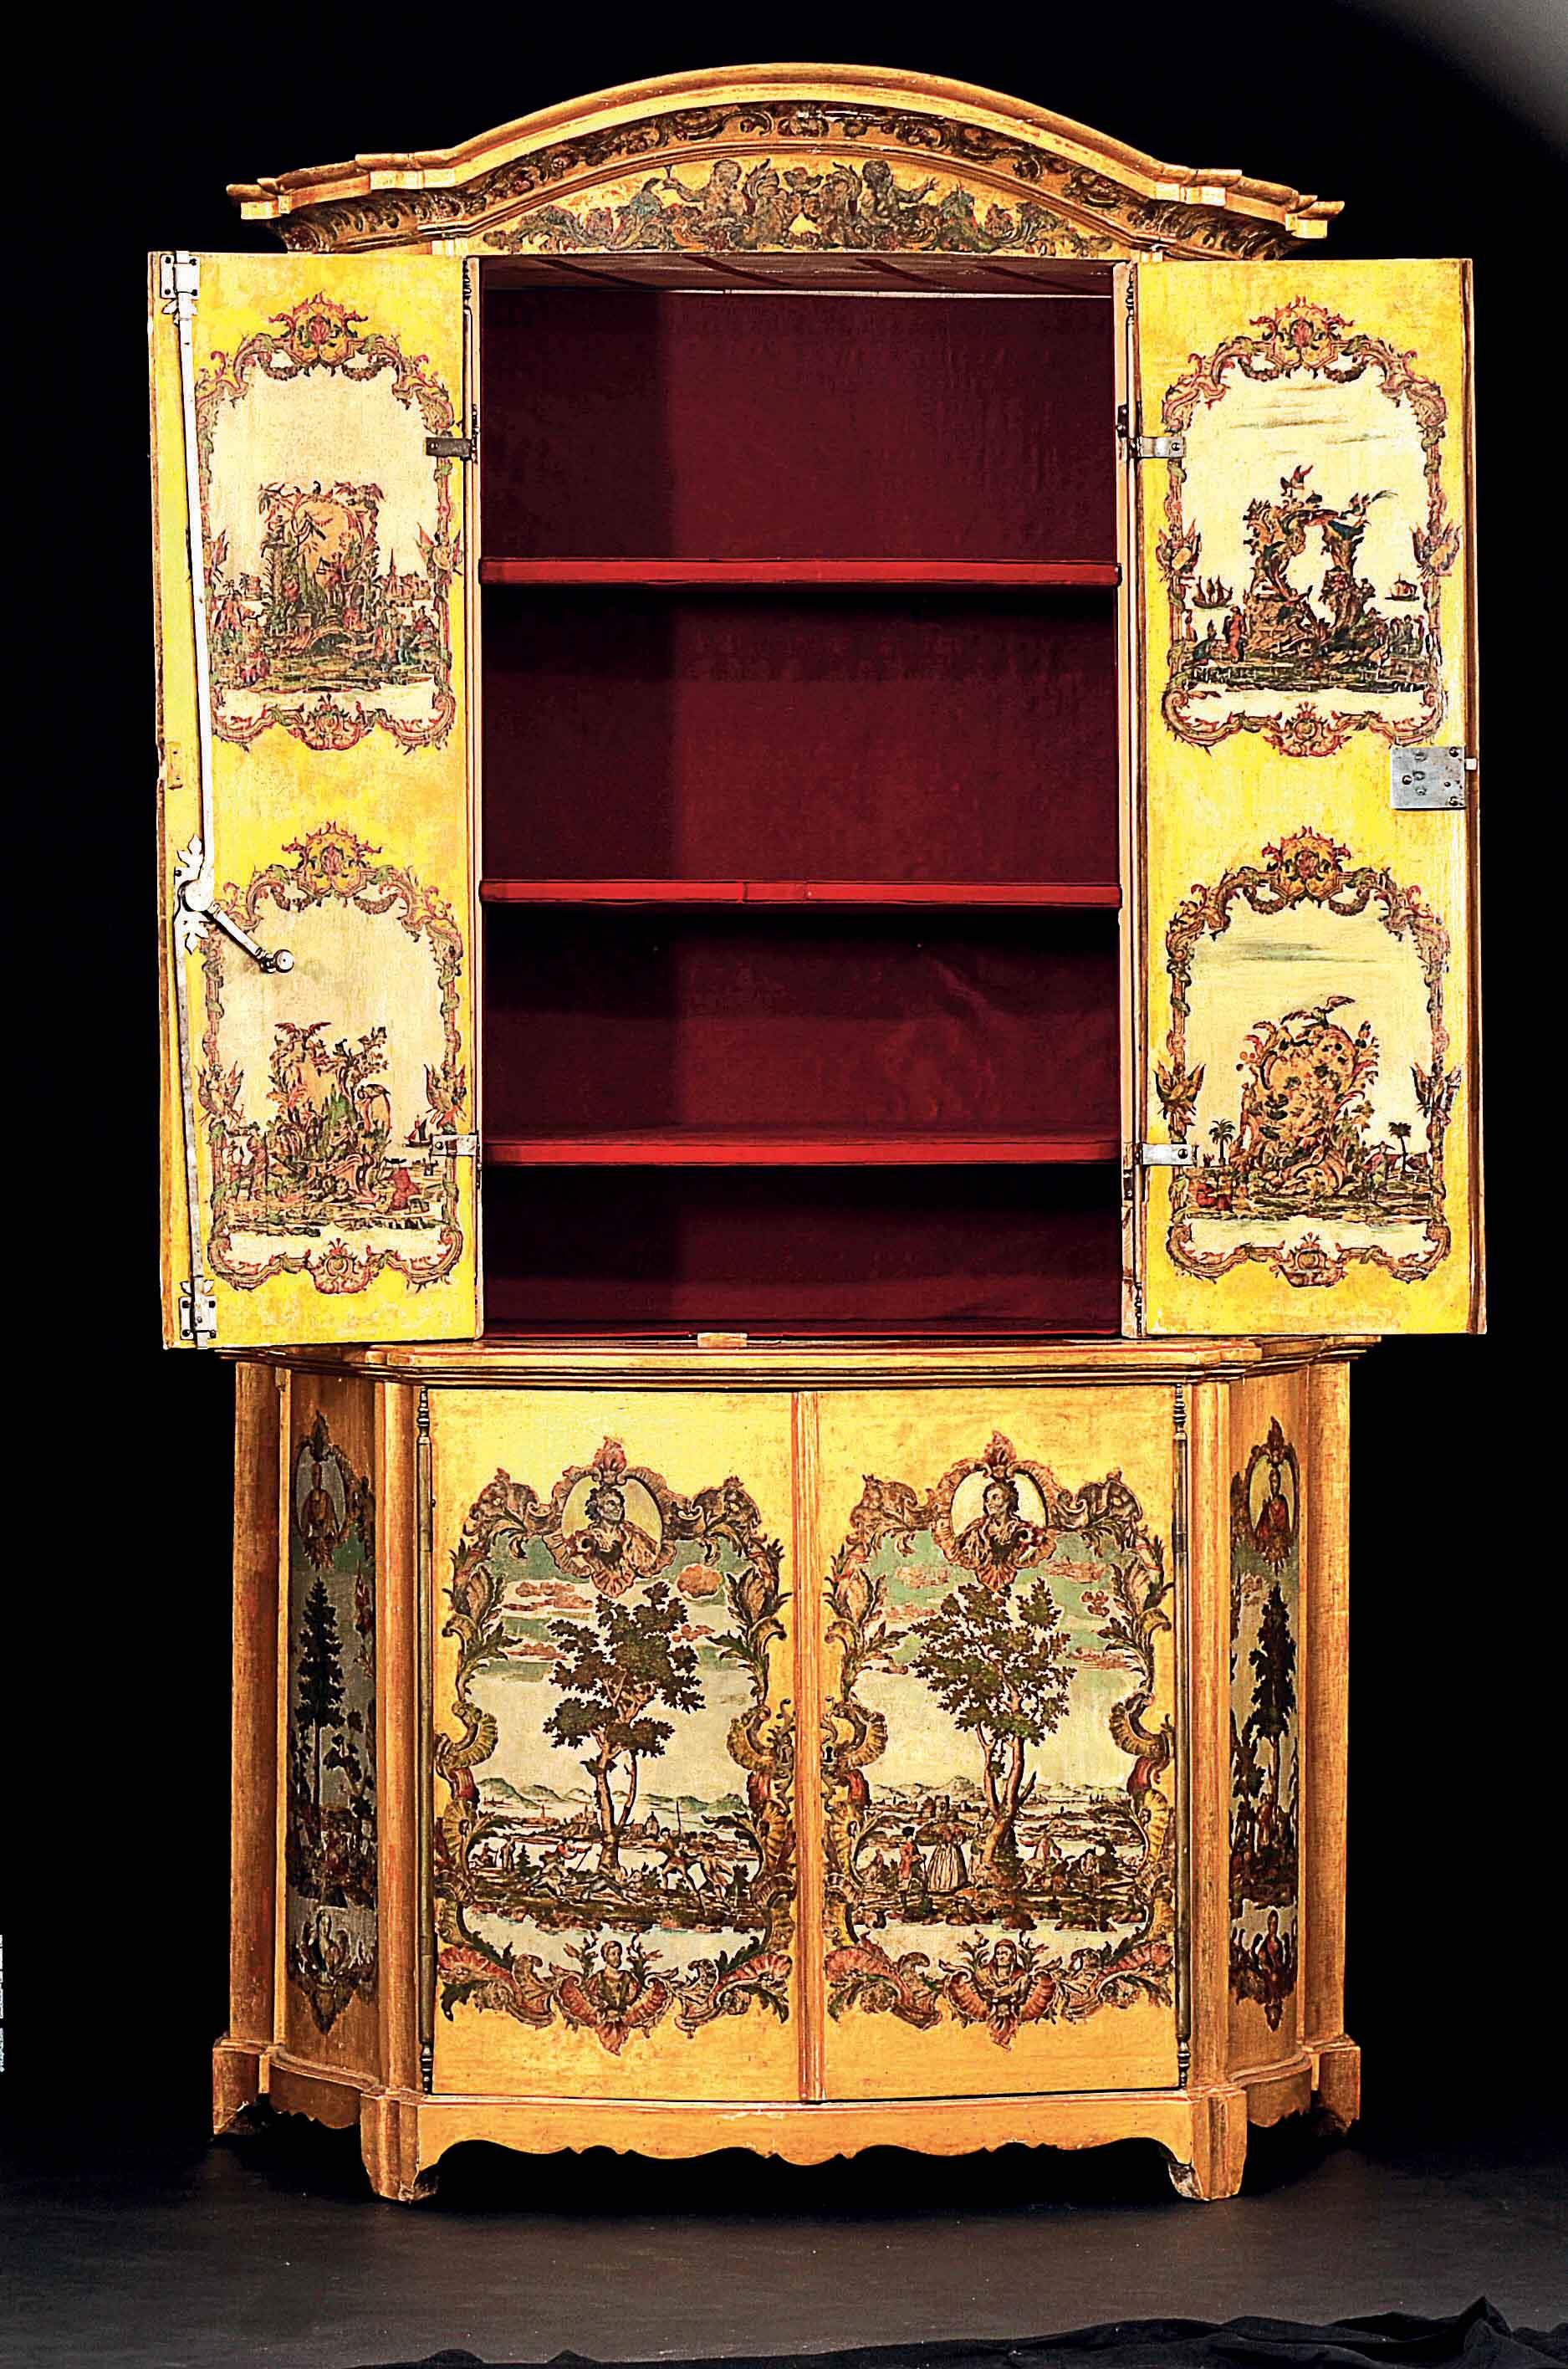 Les meubles laqu s v nitiens du xviii me si cle olia i klod for Meubles italiens contemporains